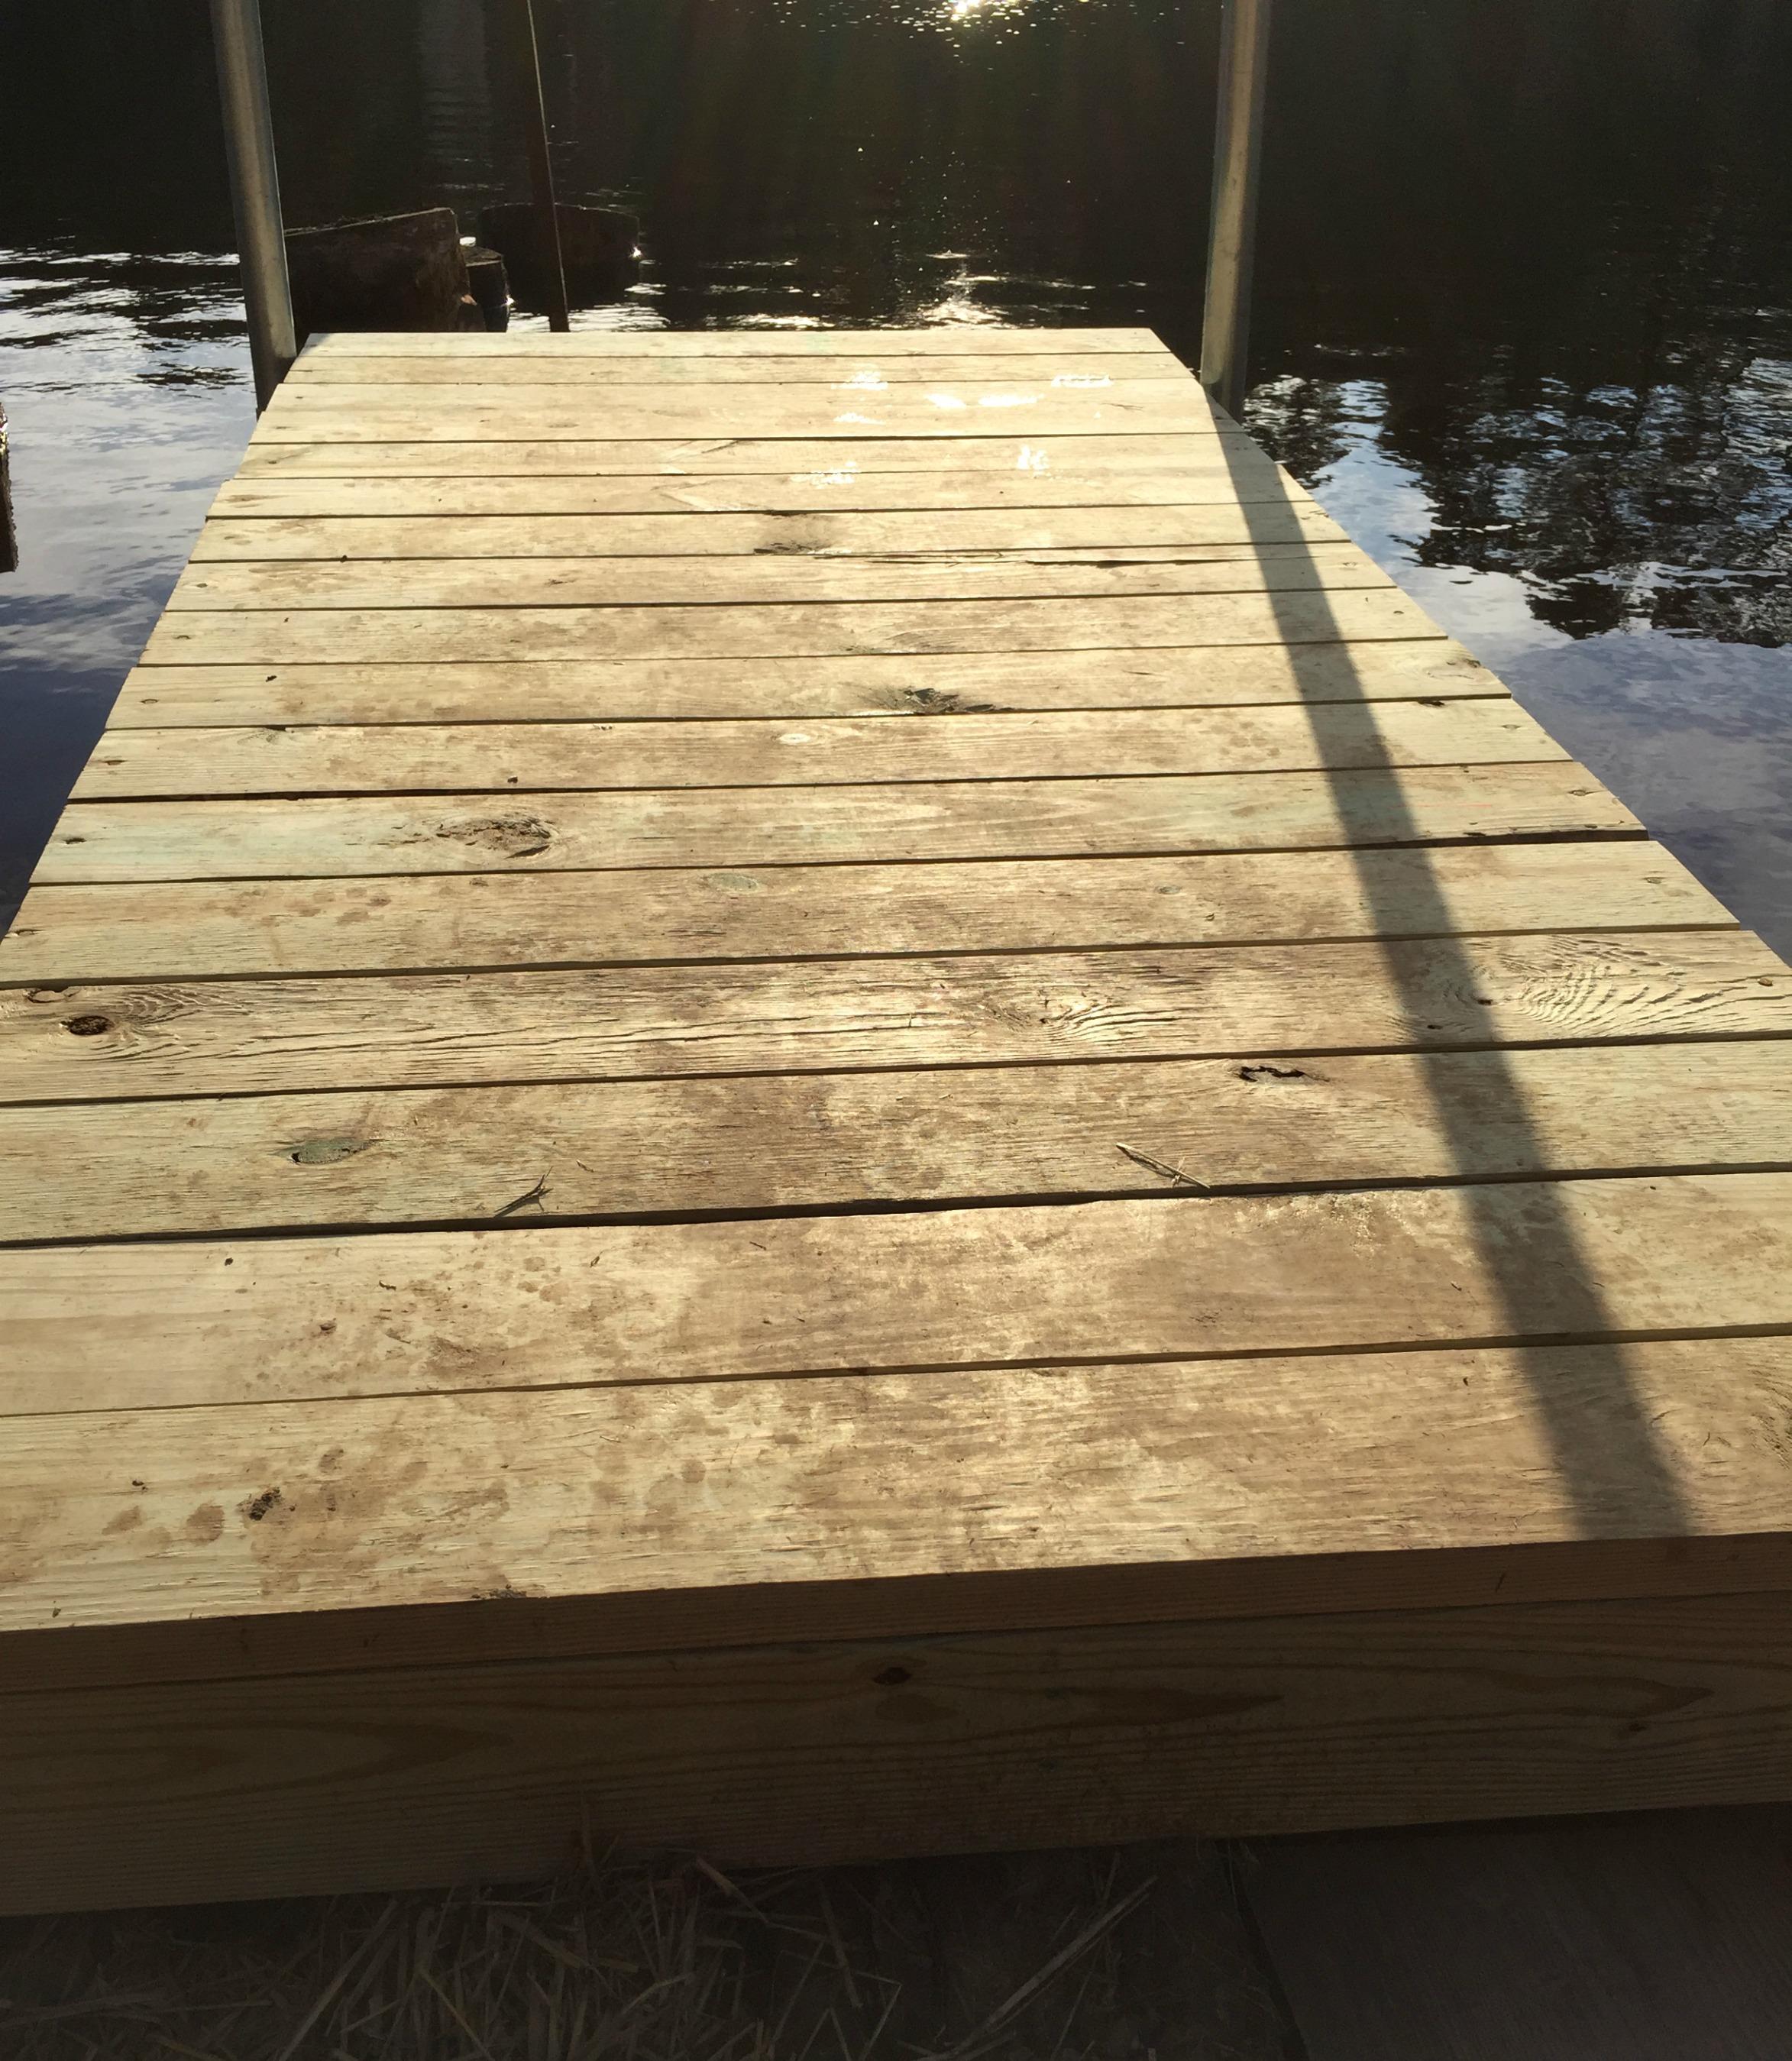 Building A Backyard Fence: Bare Feet On The Dashboard